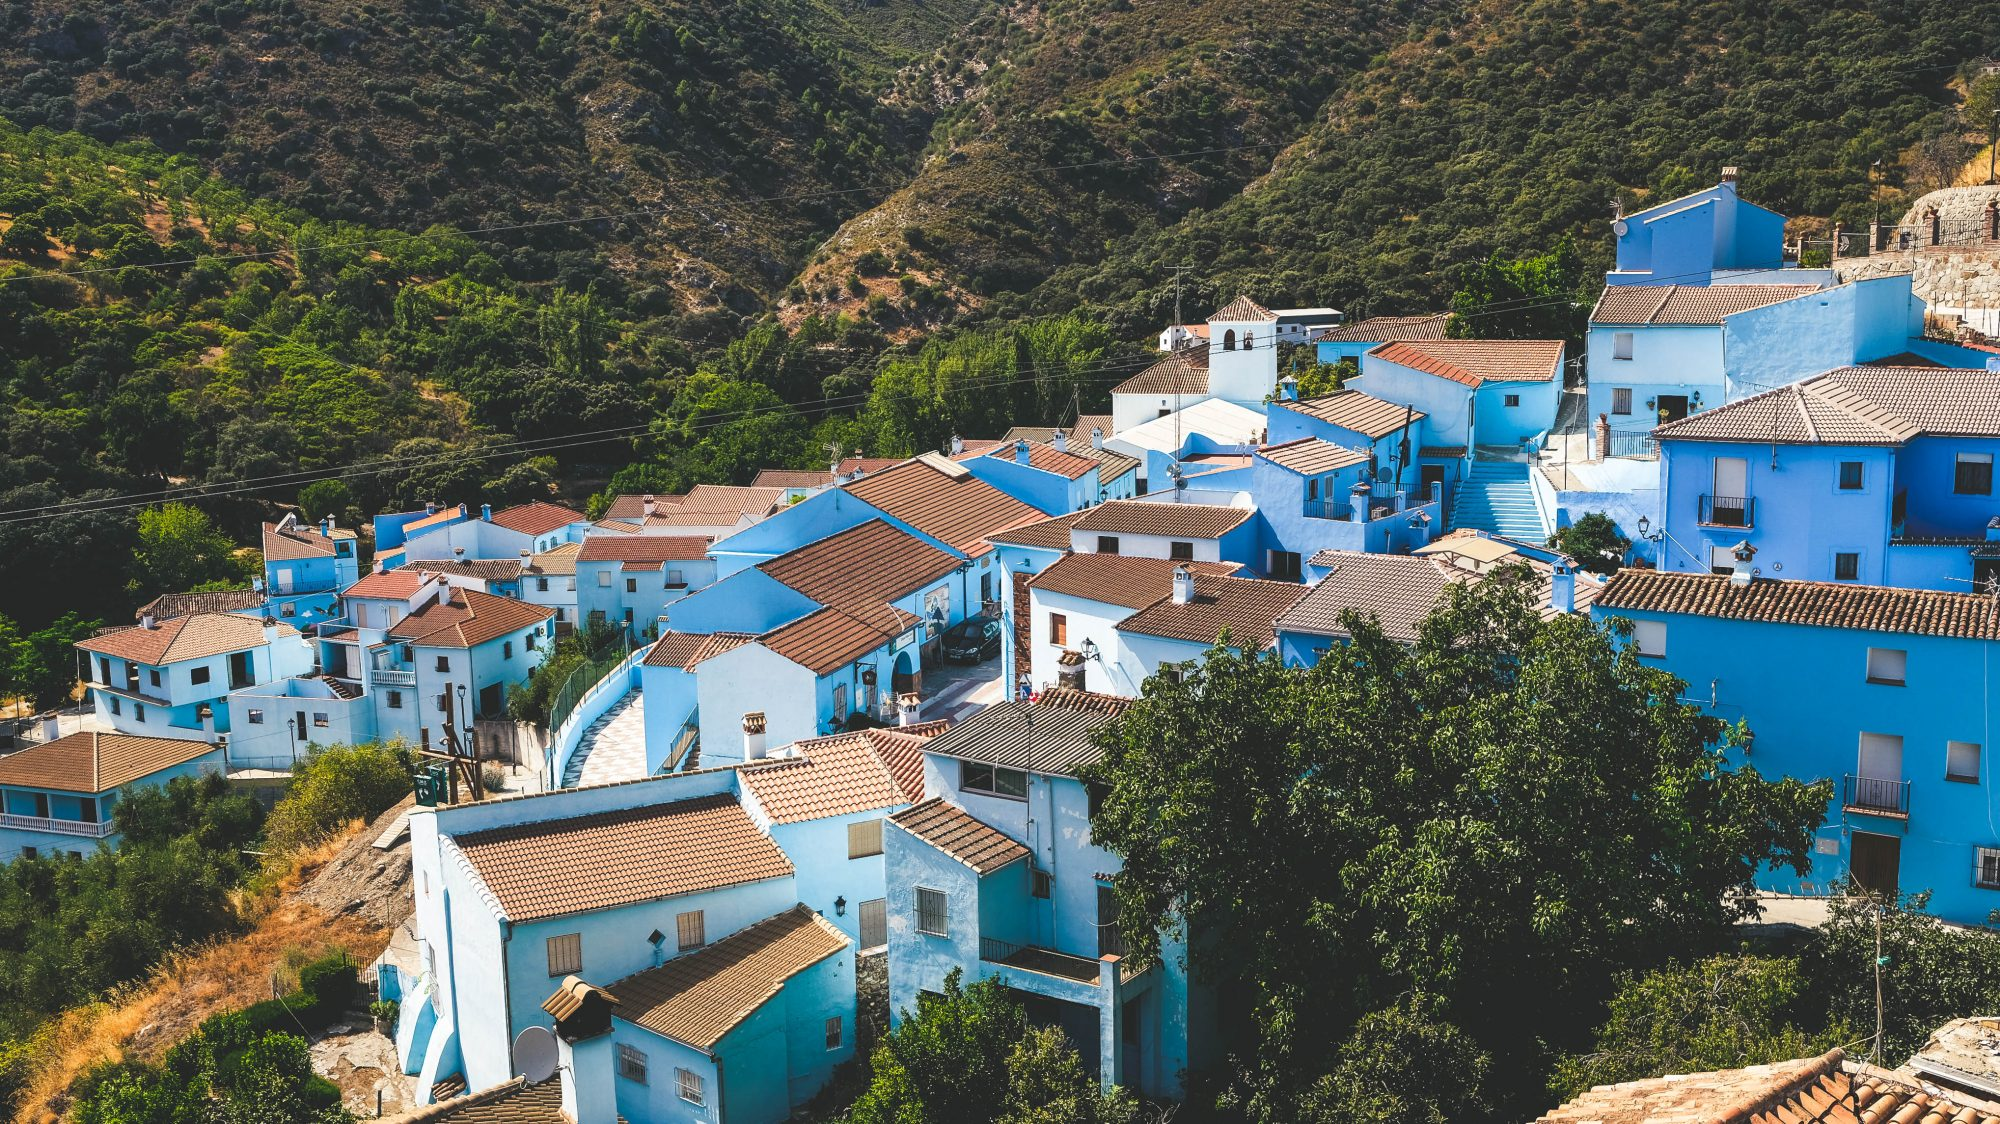 Juzcar d'en haut - Juzcar, Espagne